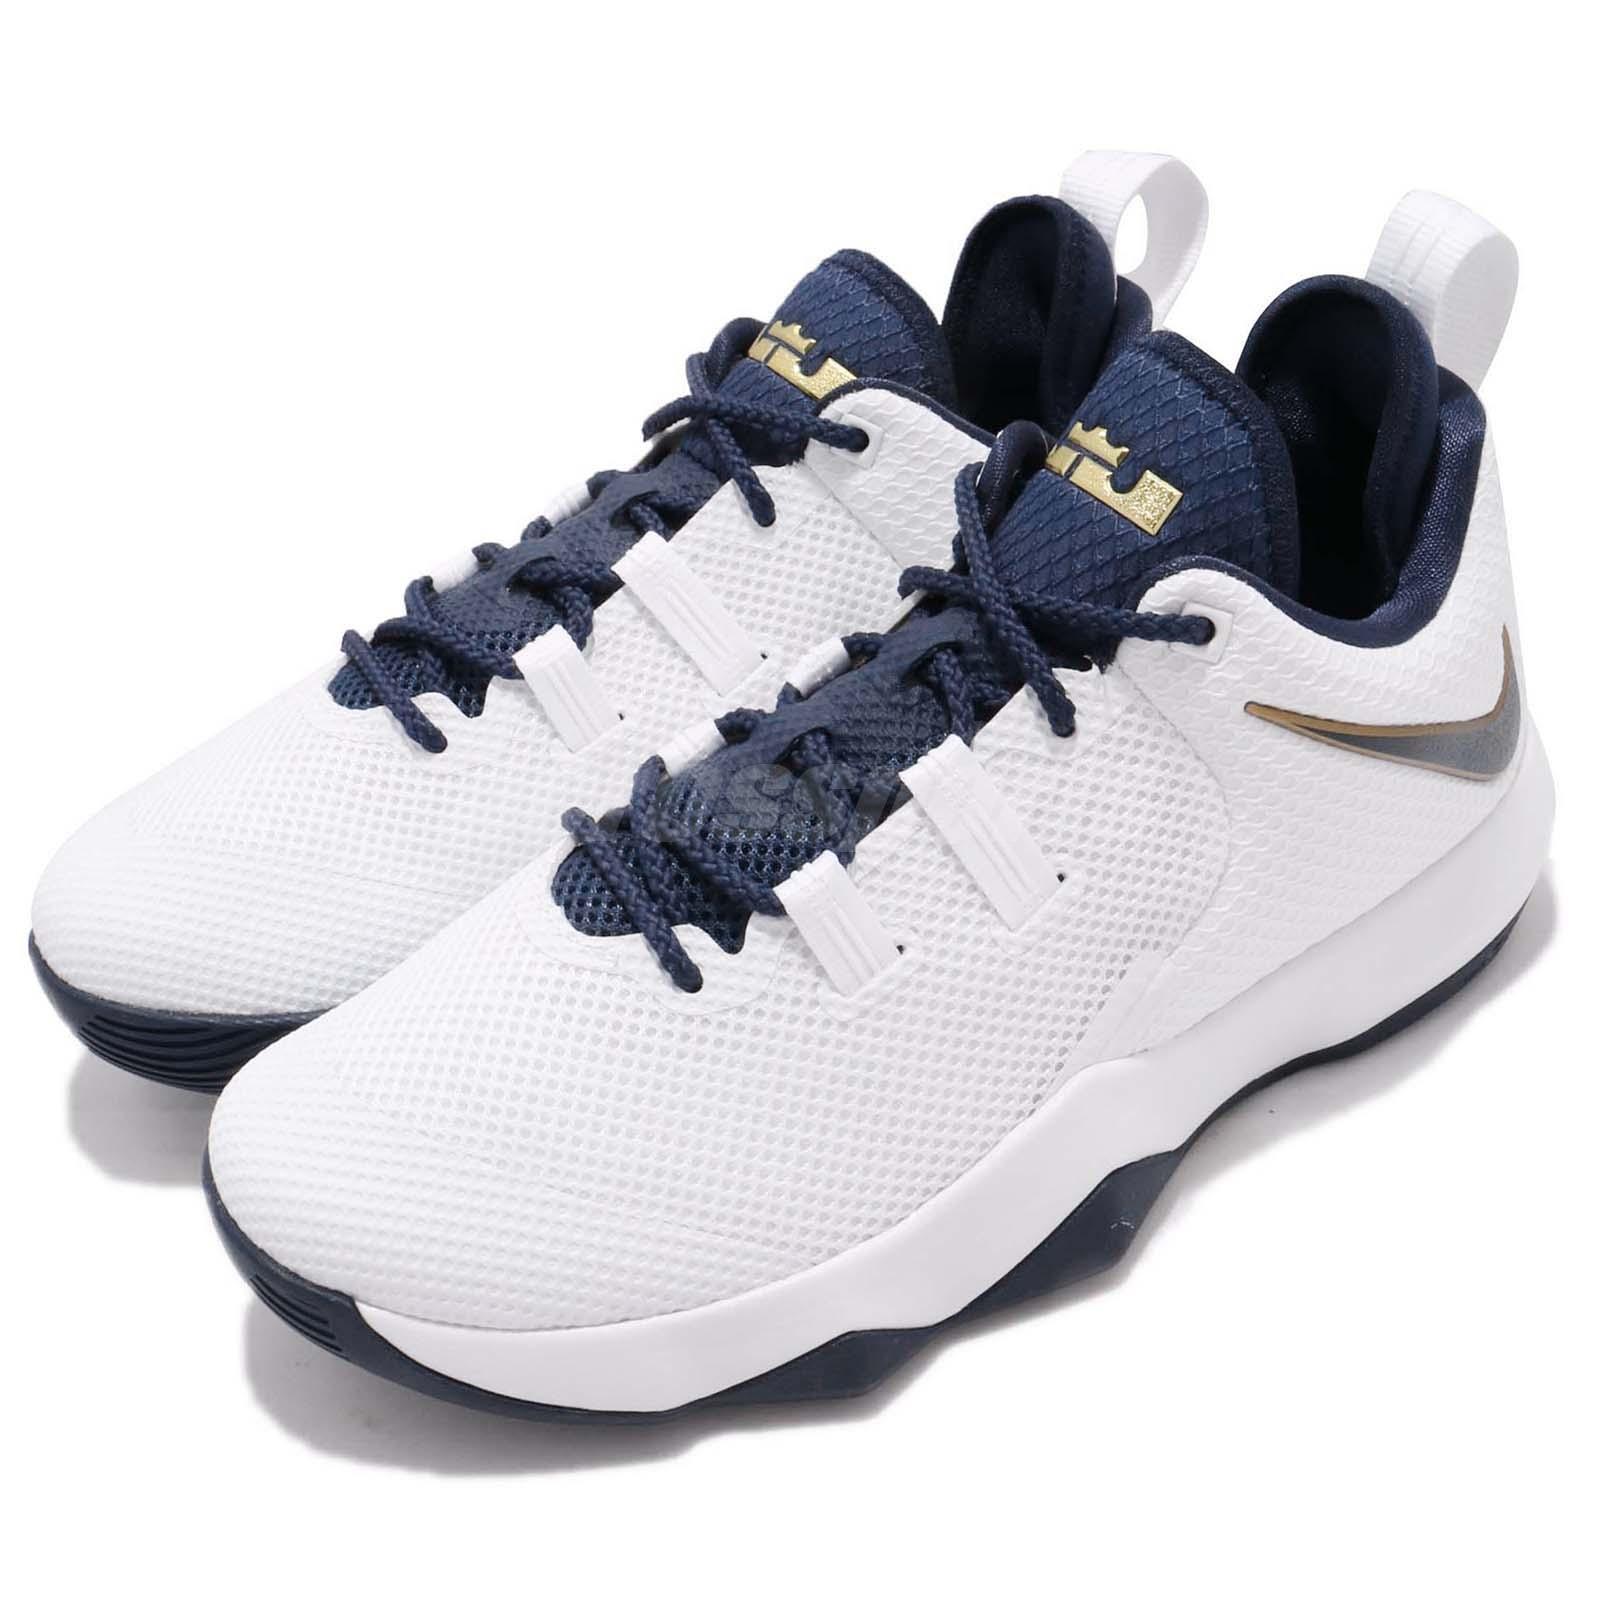 155519149c9 Details about Nike Ambassador X 10 Lebron James White Gold Navy Men  Basketball Shoe AH7580-100